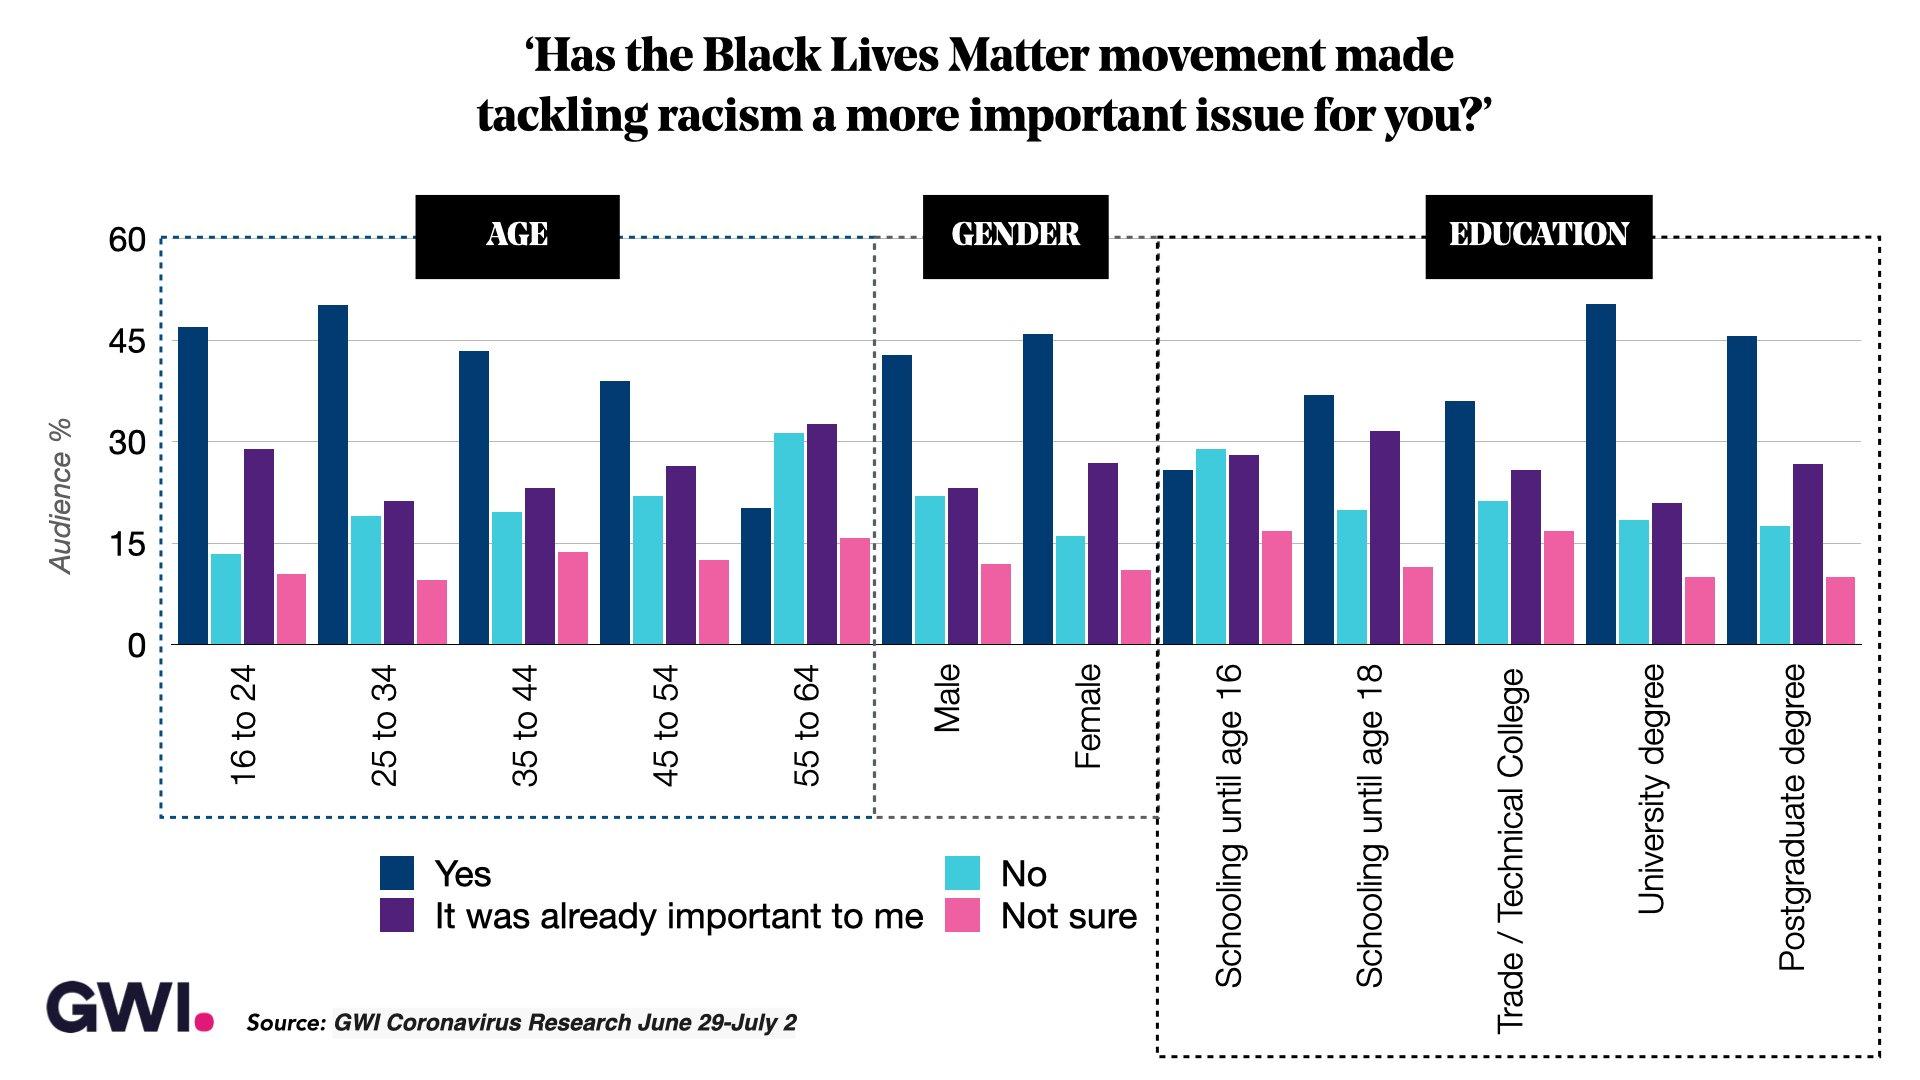 Black Lives Matter - GWI & Audiense